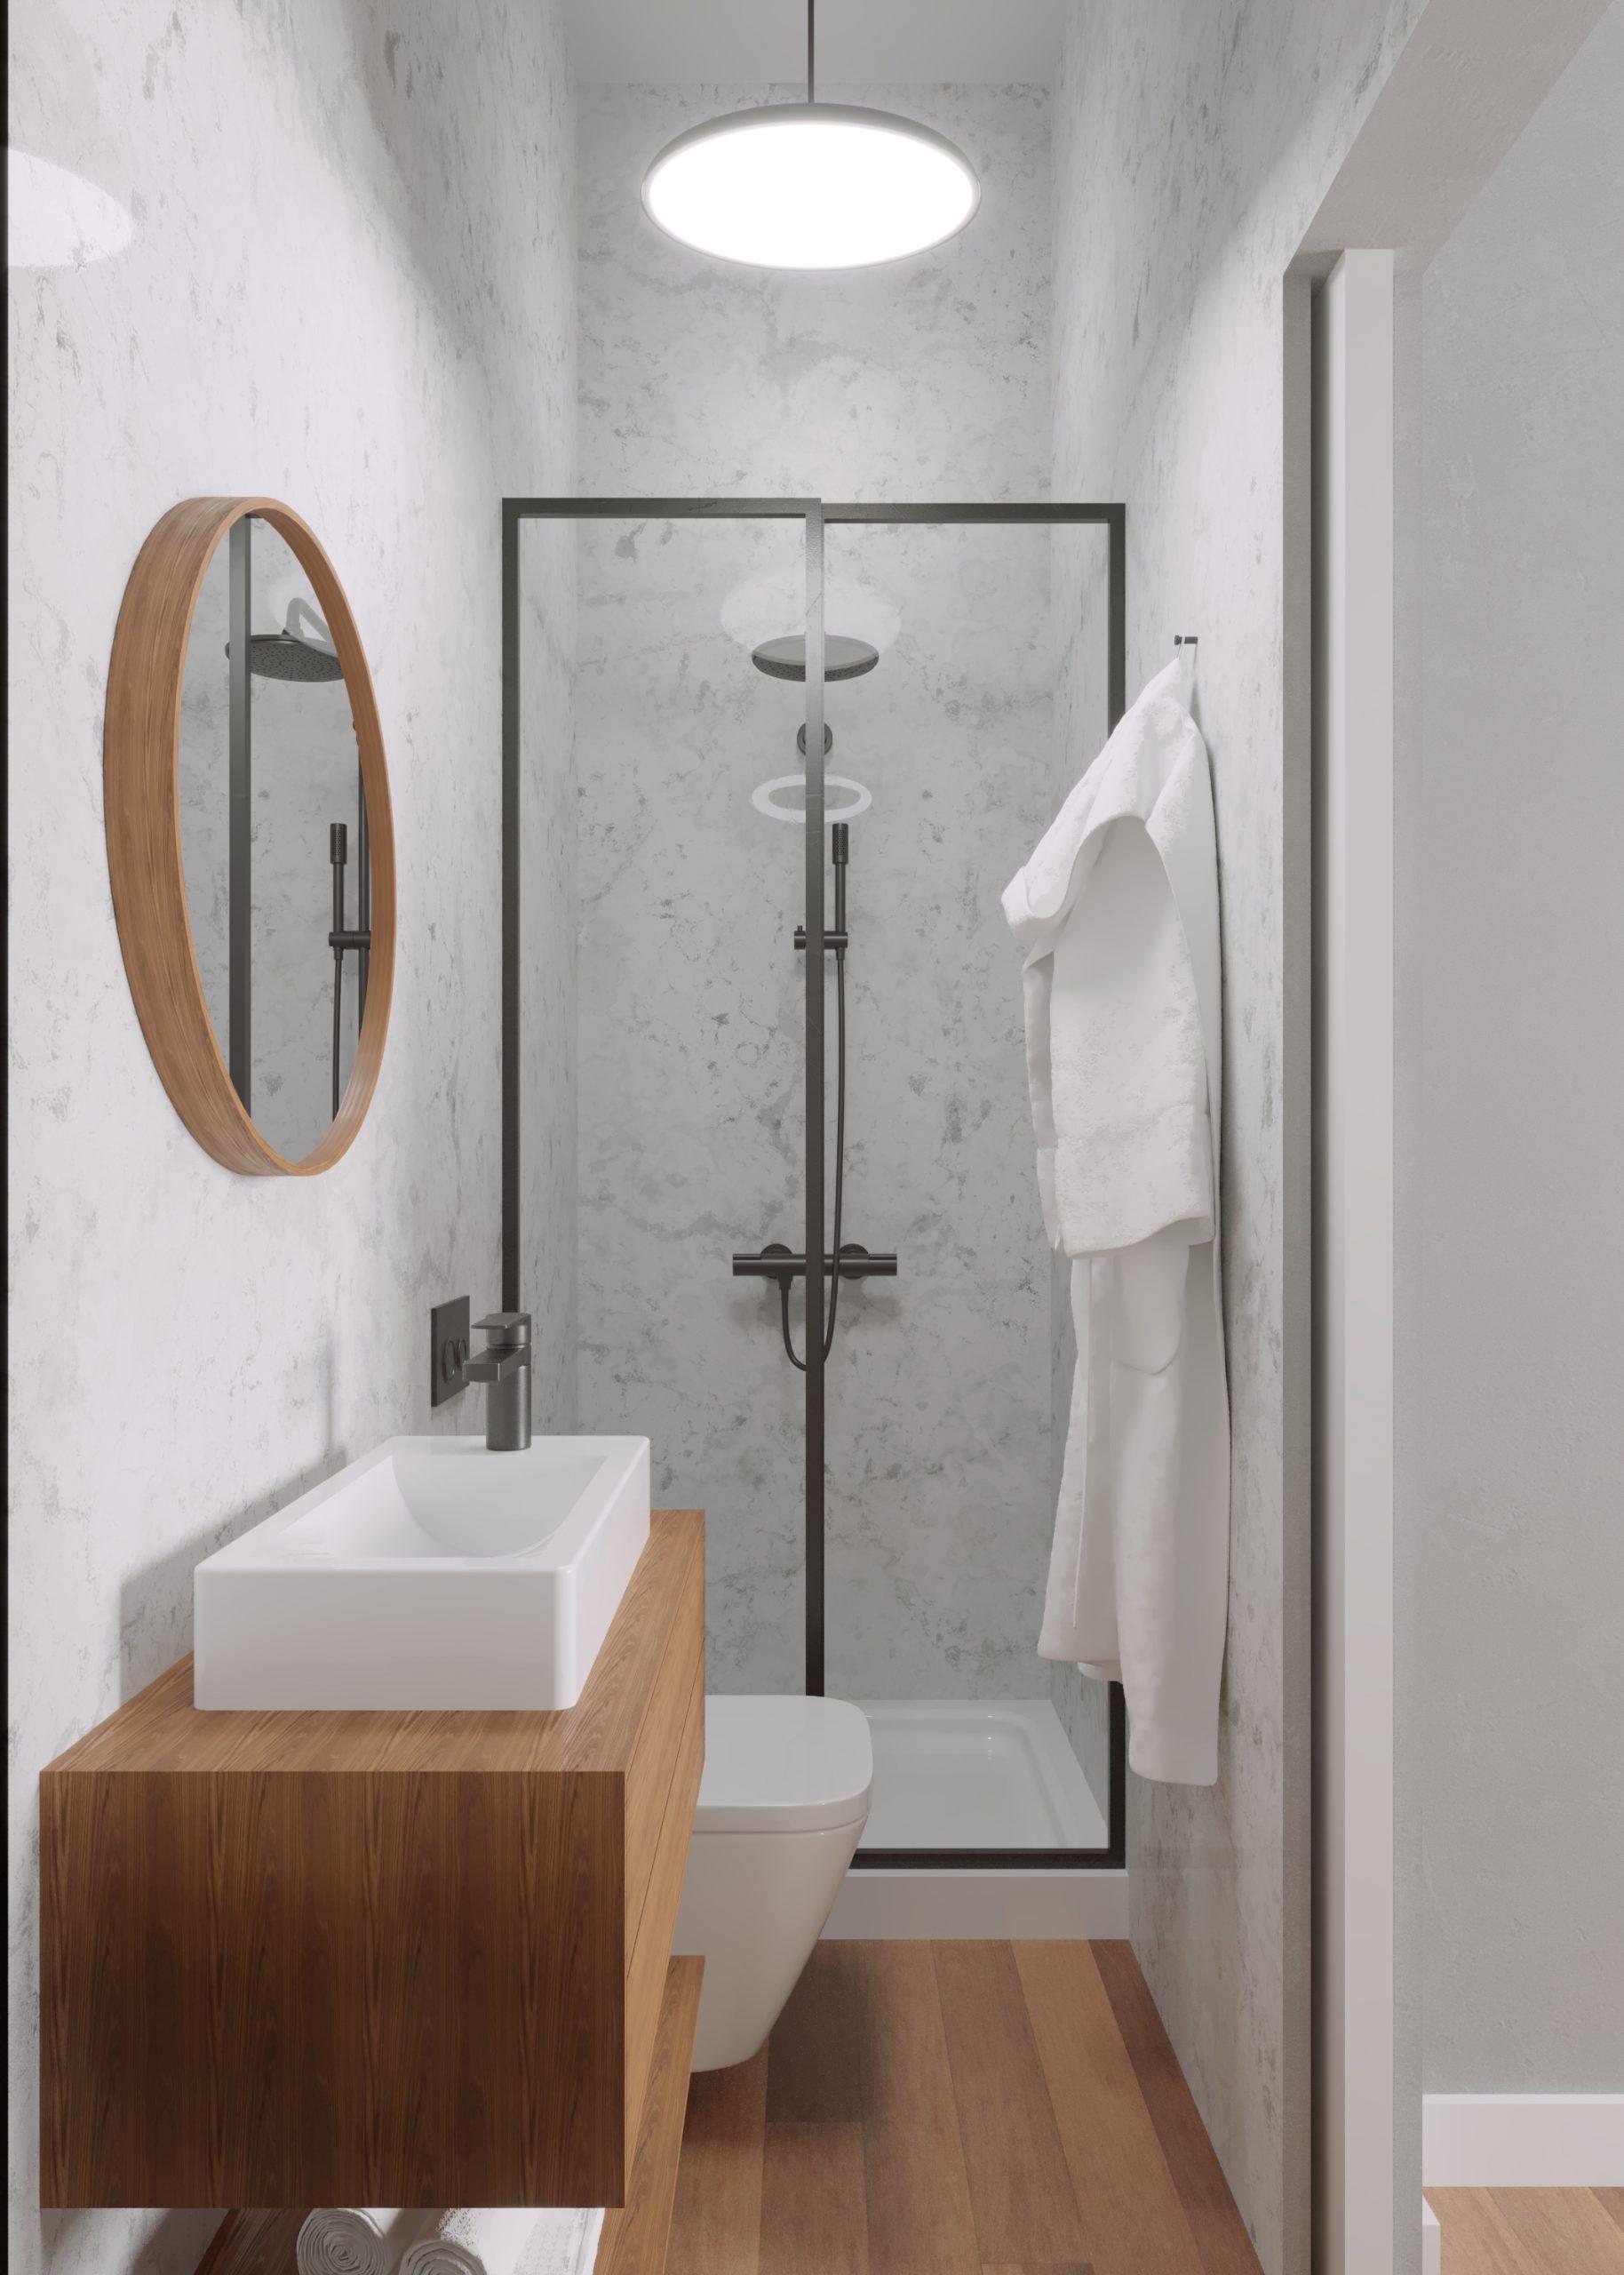 https://muto.pt/wp-content/uploads/2020/08/Muto_Edif.R.Crucifixo_V4_Piso02_Apt.Dir_Bathroom2Portrait3K_R01_Temp6000K-scaled.jpg